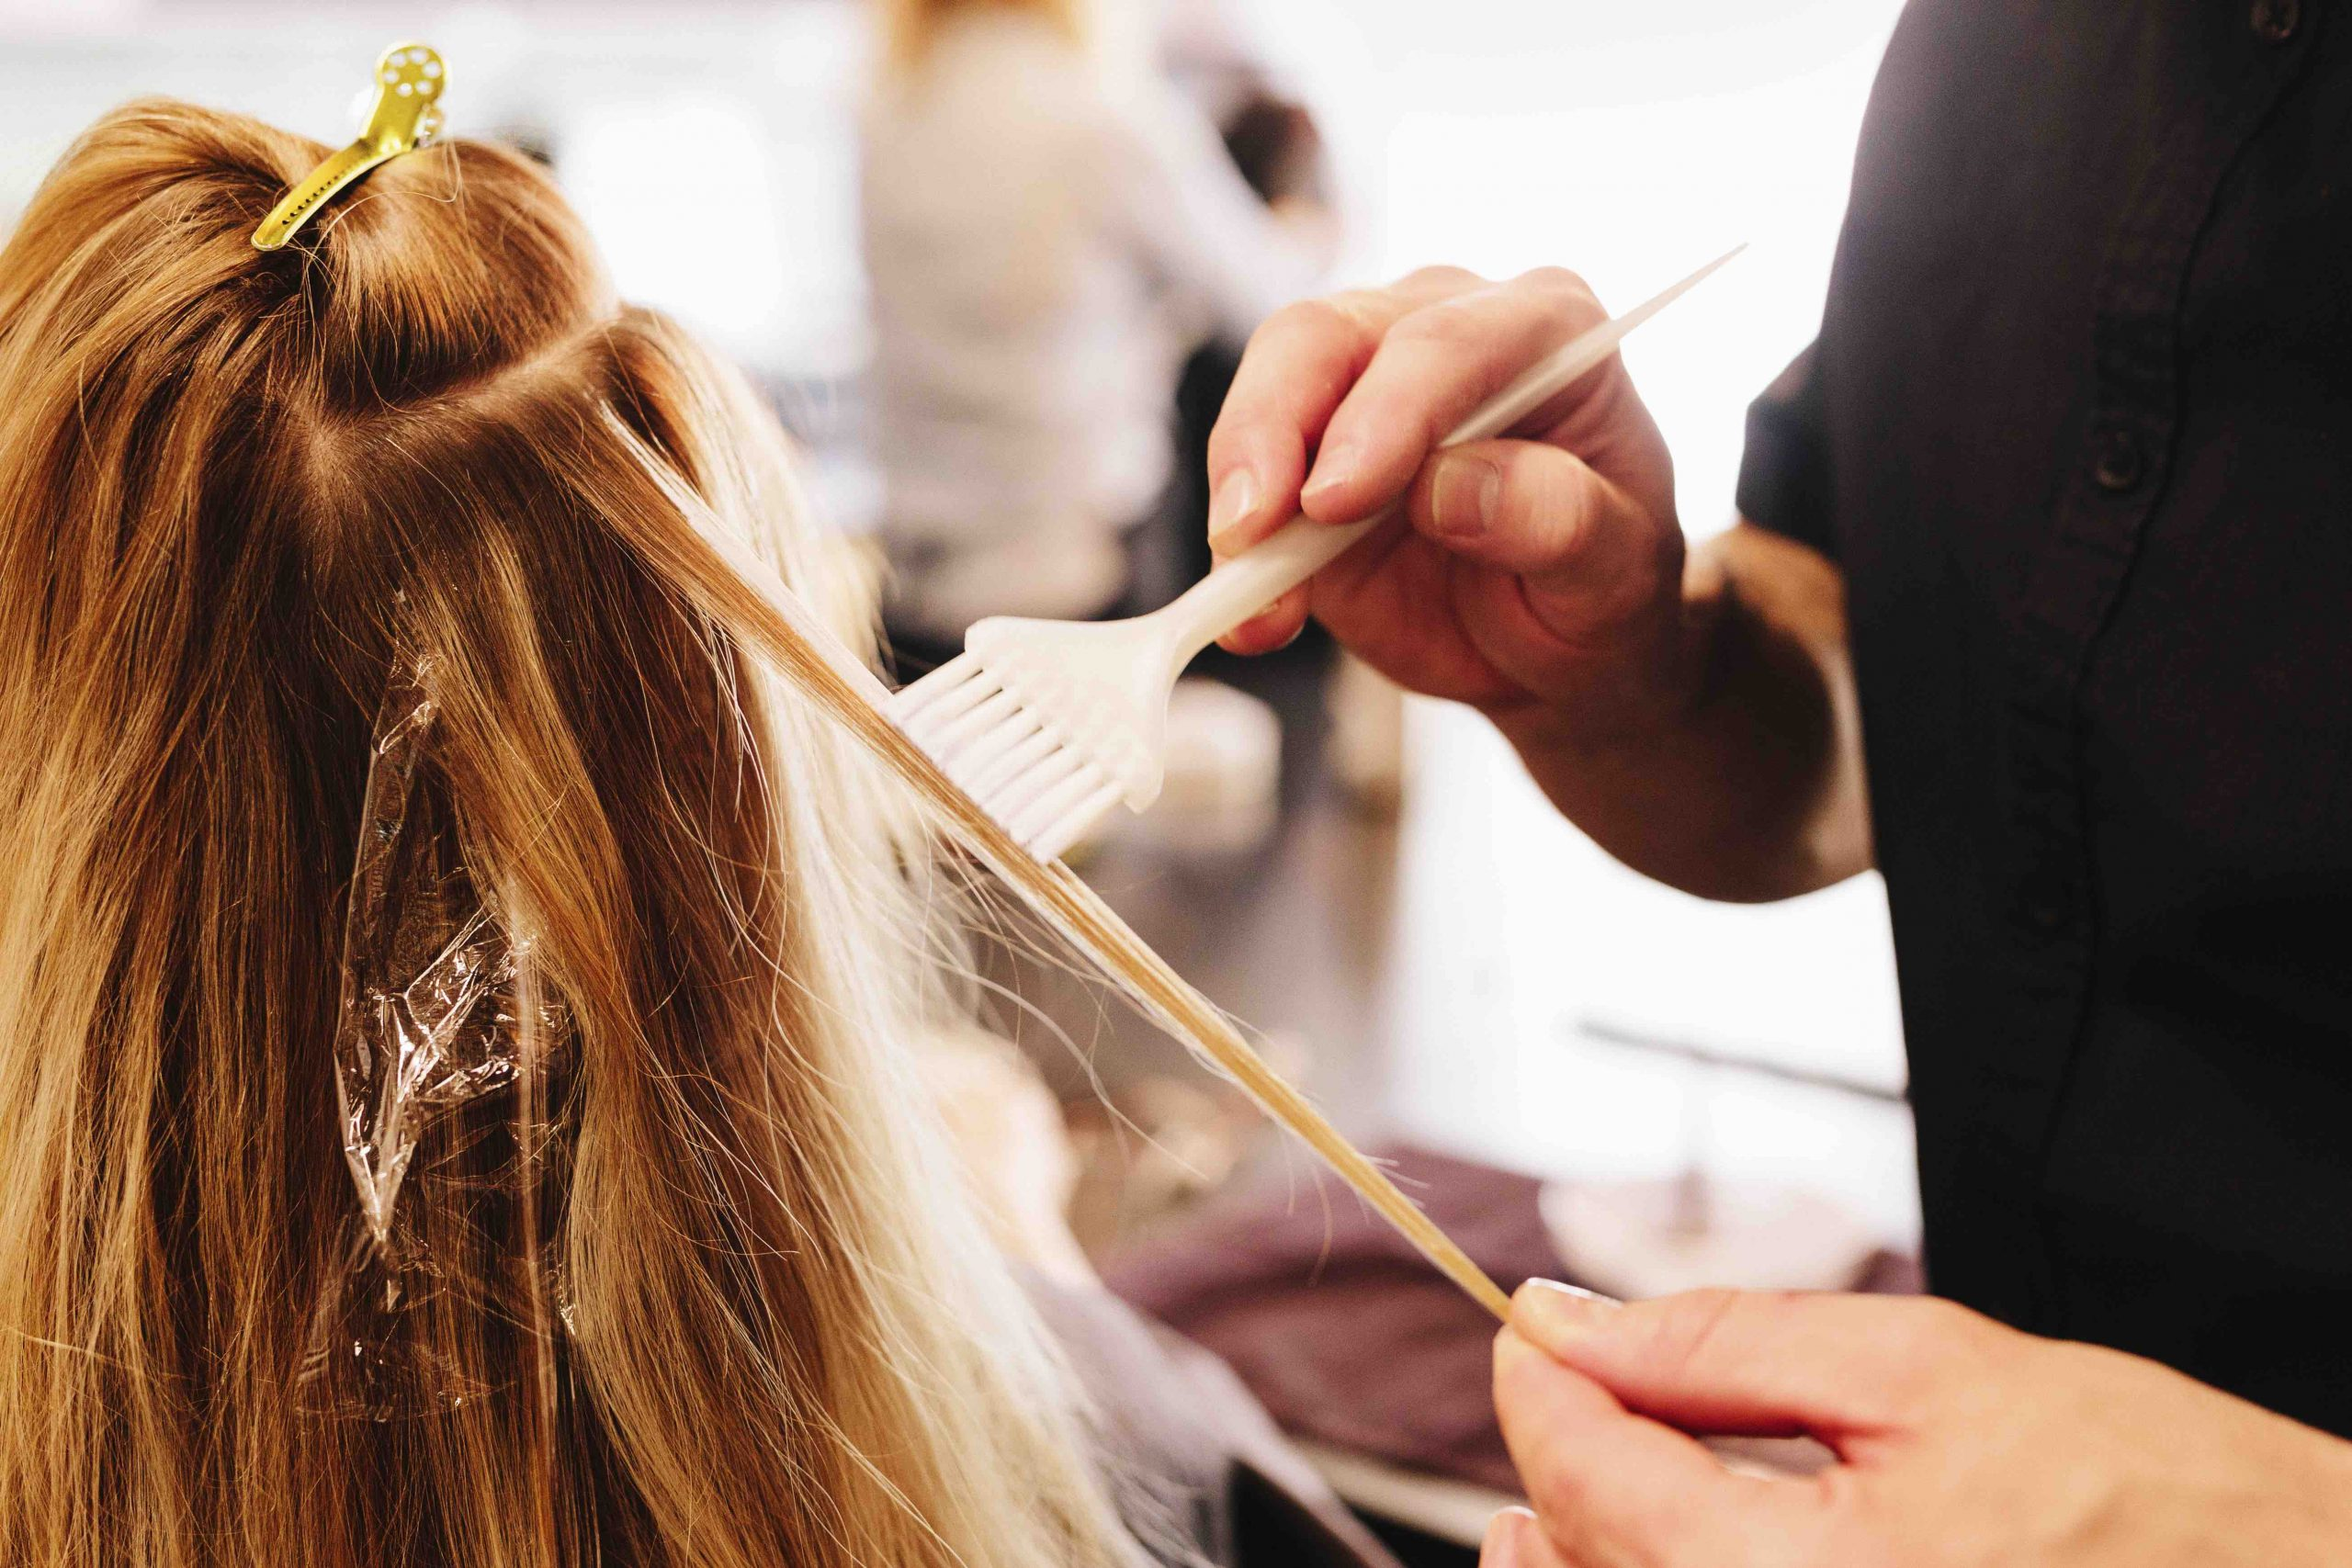 hairdresser putting hair dye on woman's head